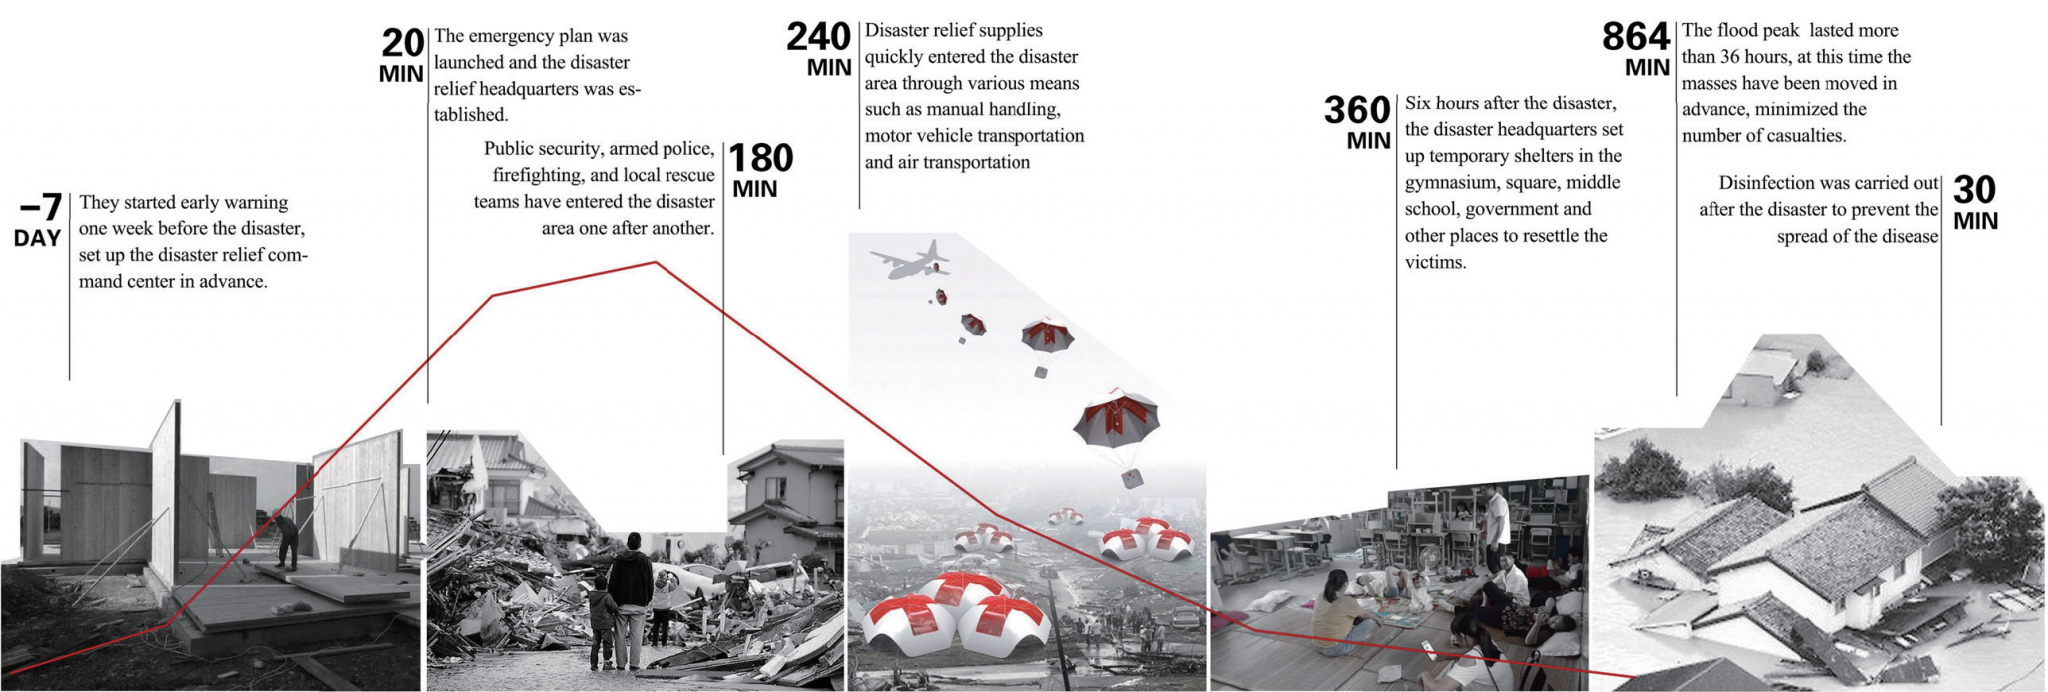 Emergency plan/灾害预警与处置体系